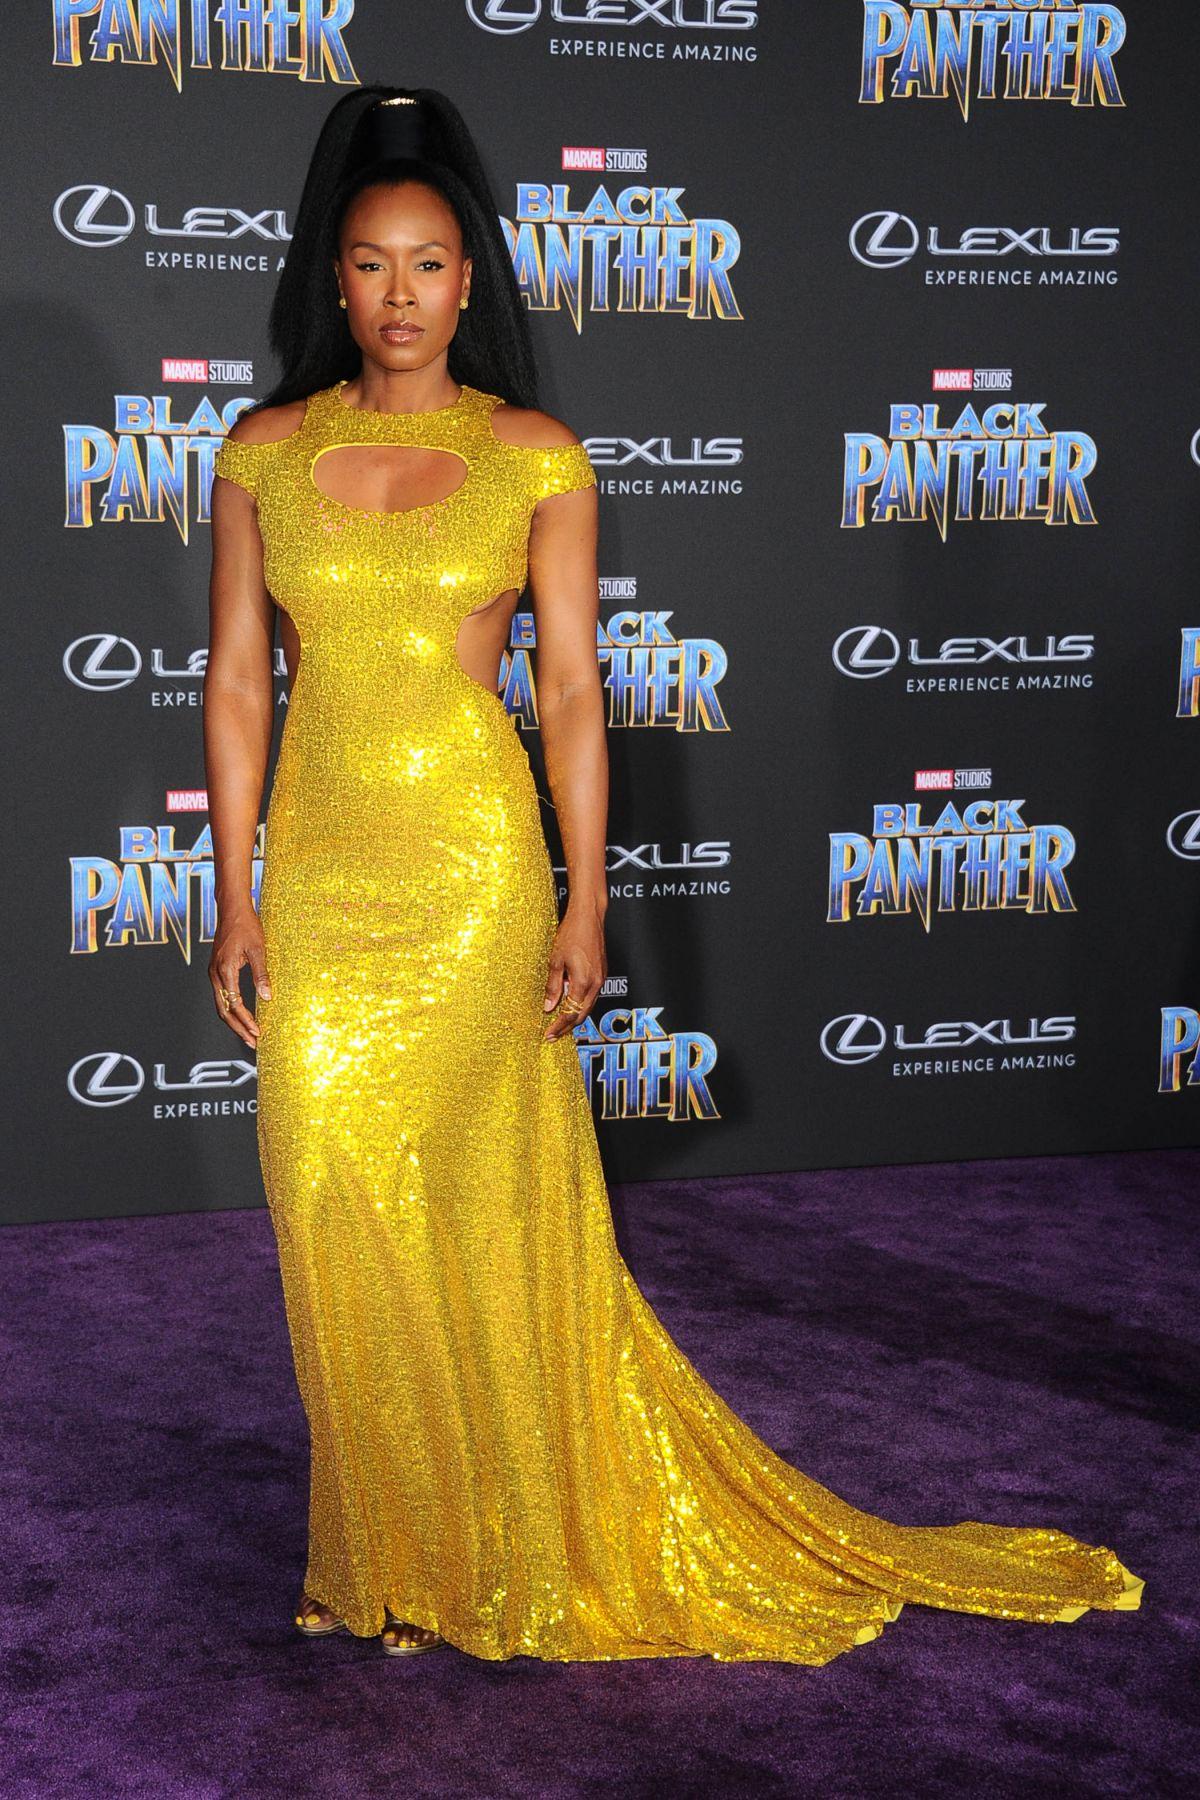 black noel 2018 SYDELLE NOEL at Black Panther Premiere in Hollywood 01/29/2018  black noel 2018